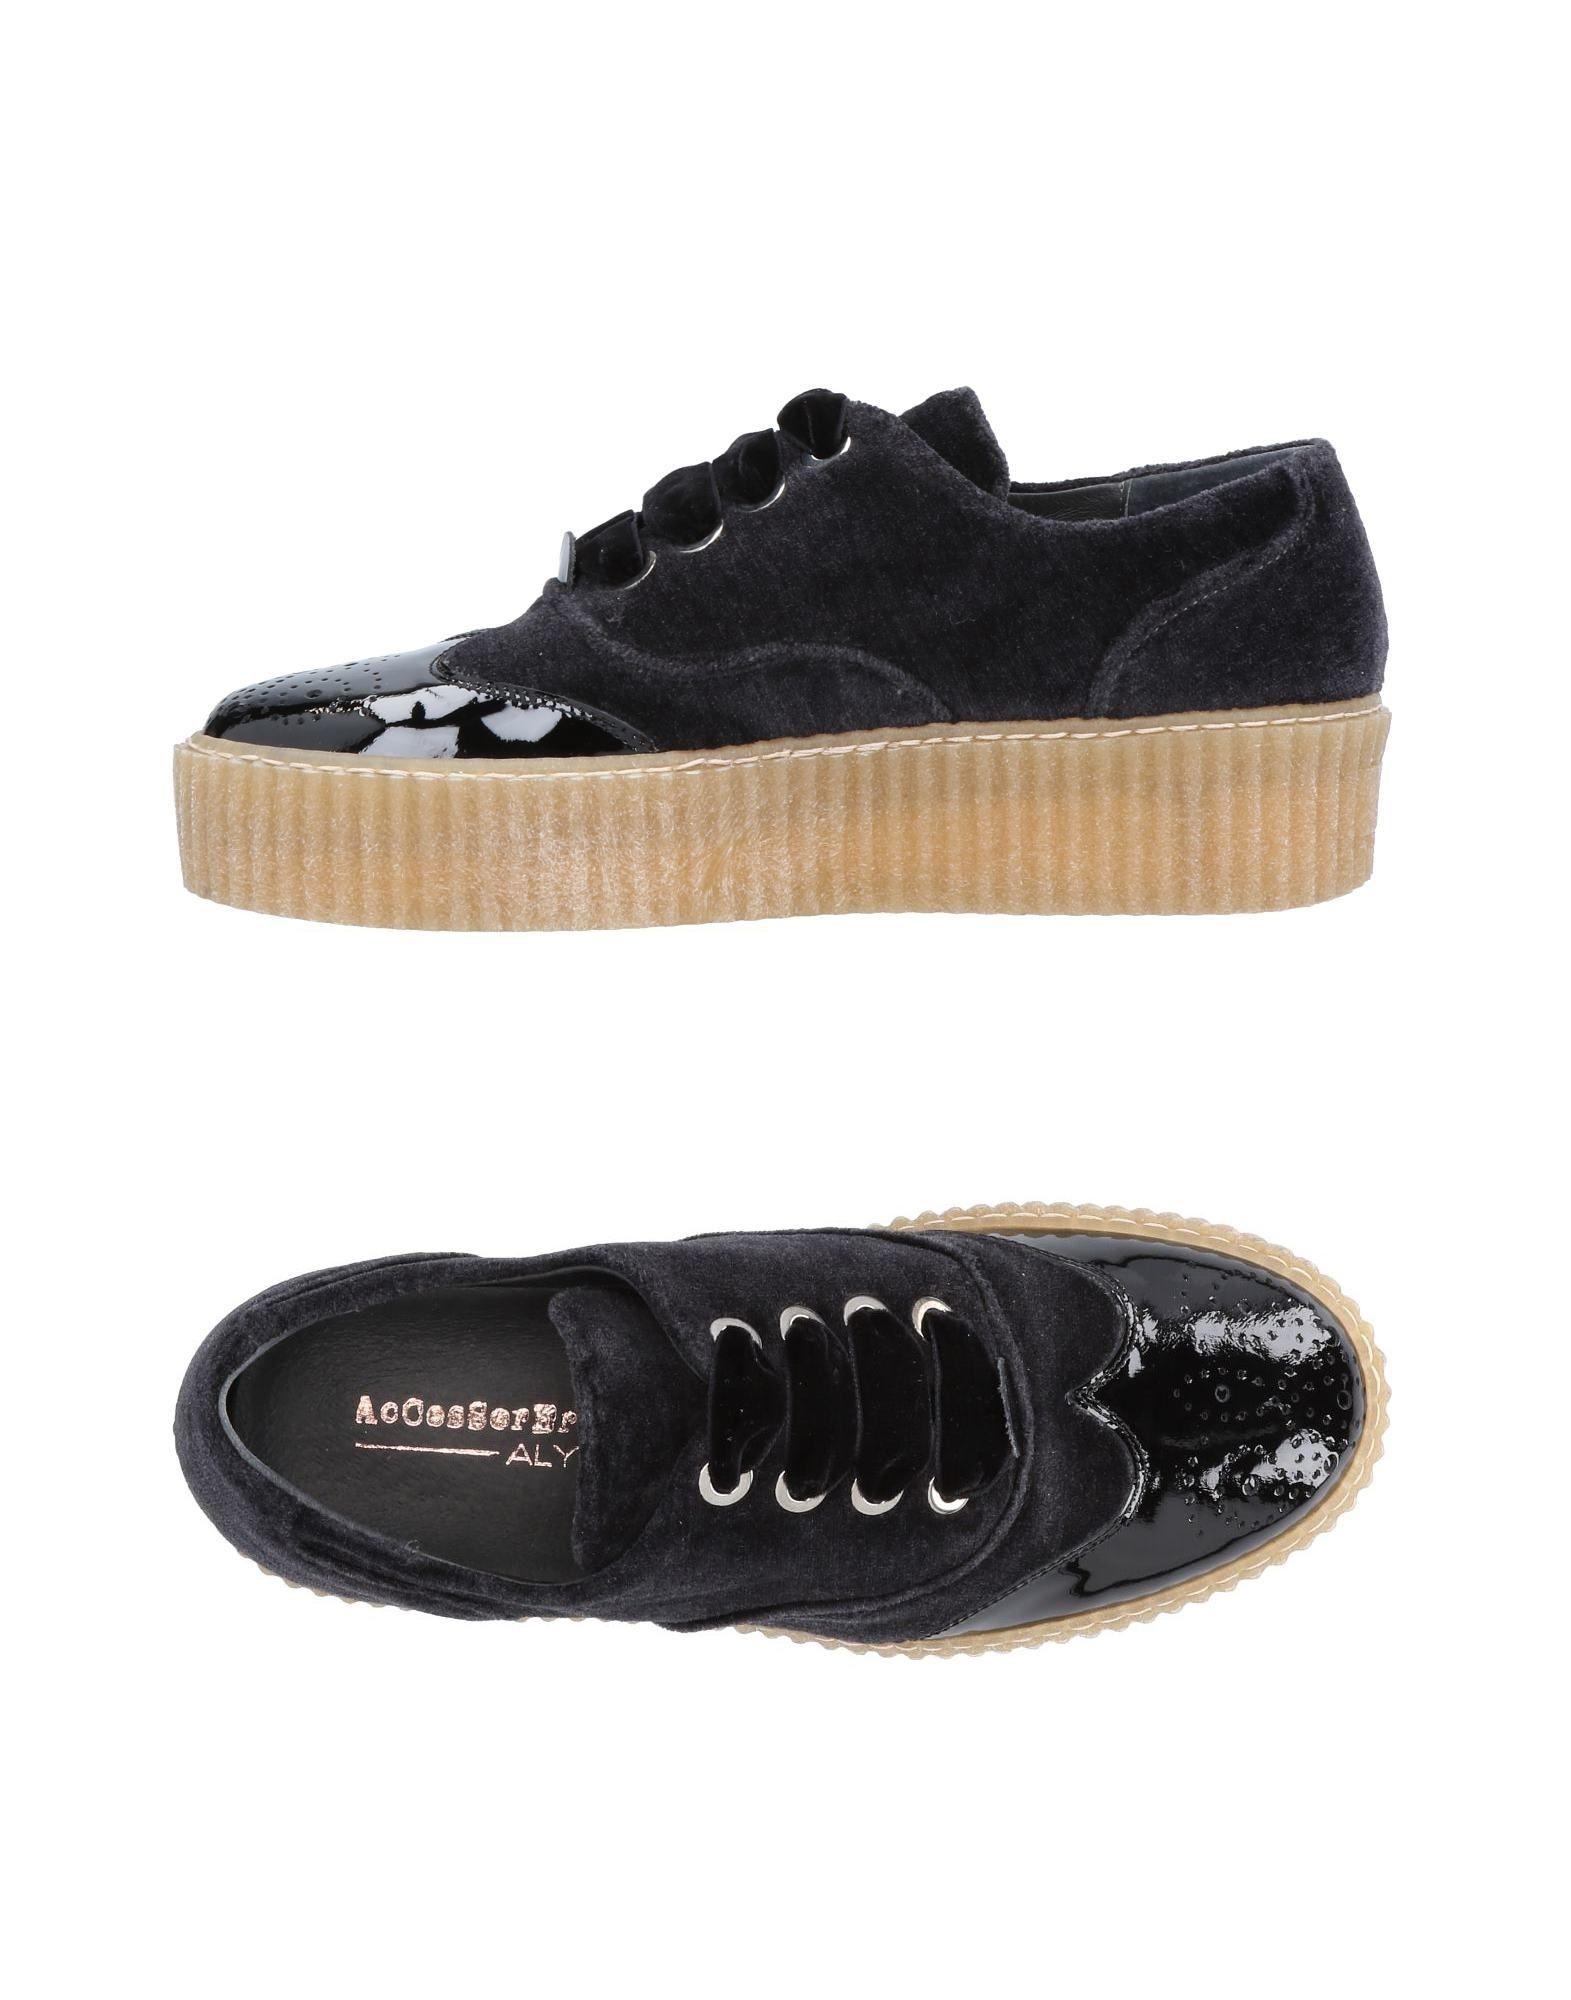 Moda Sneakers Alysi Donna Donna Alysi - 11495914XL a0533a